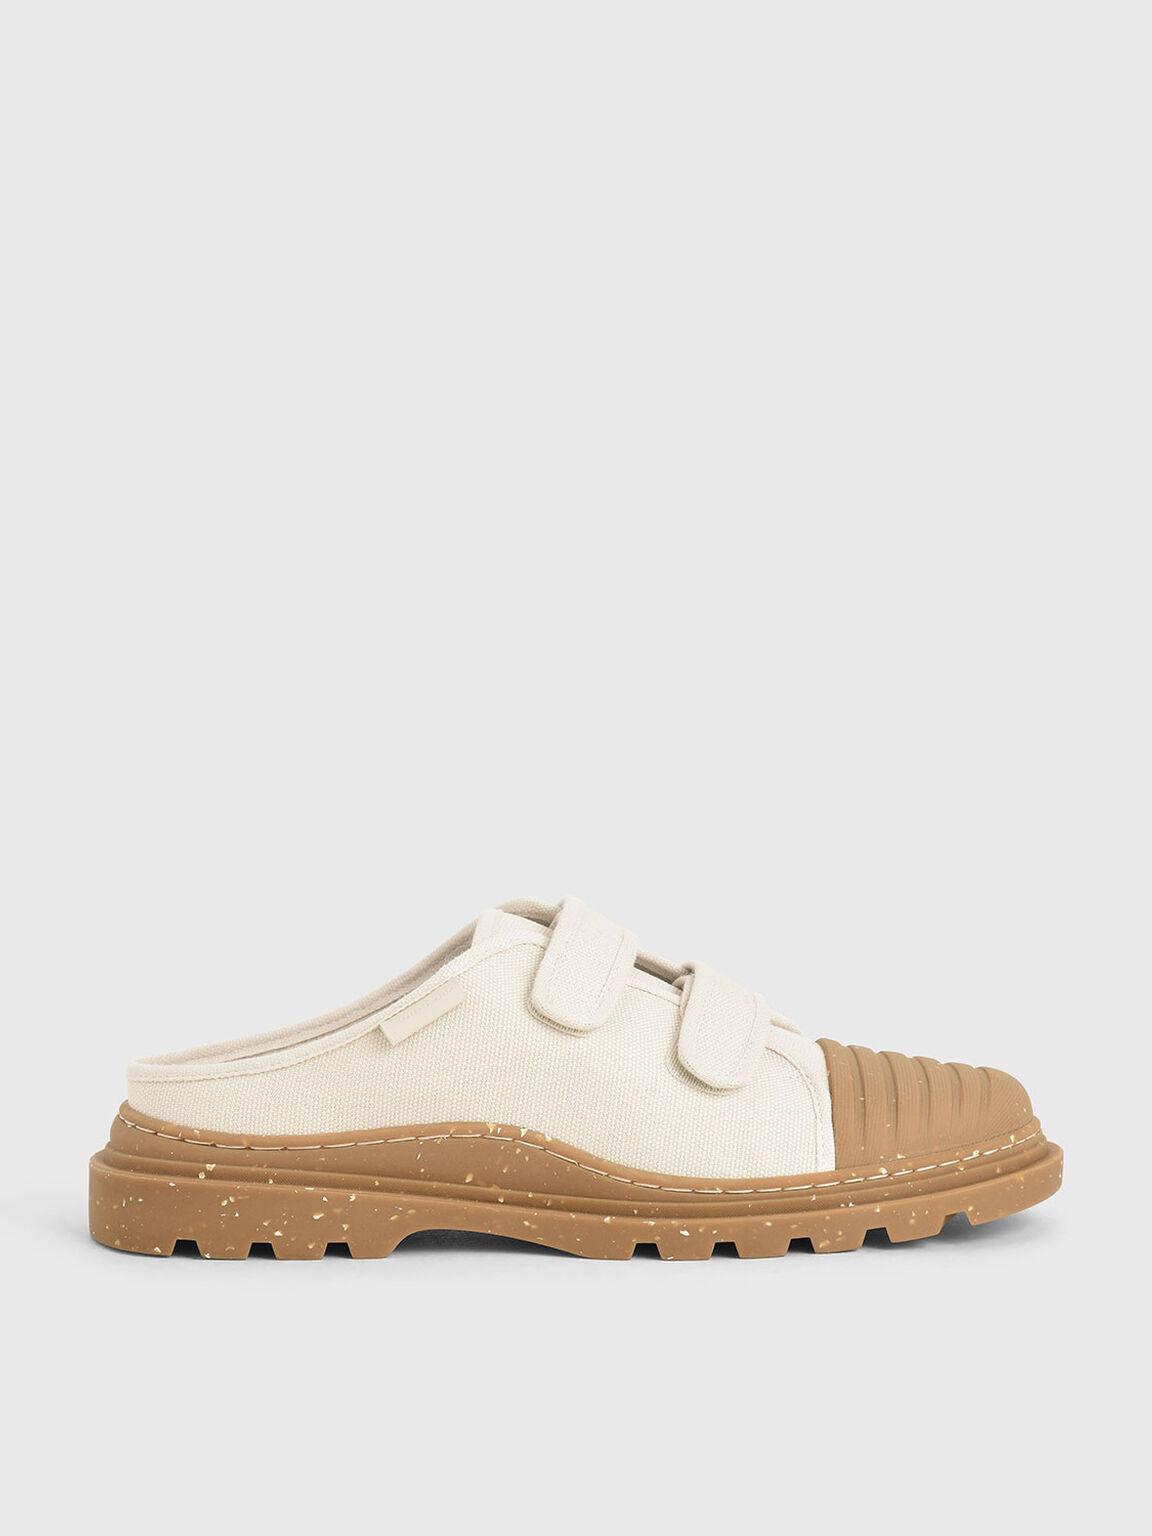 The Purpose Collection - Velcro Strap Sneaker Mules, Cream, hi-res